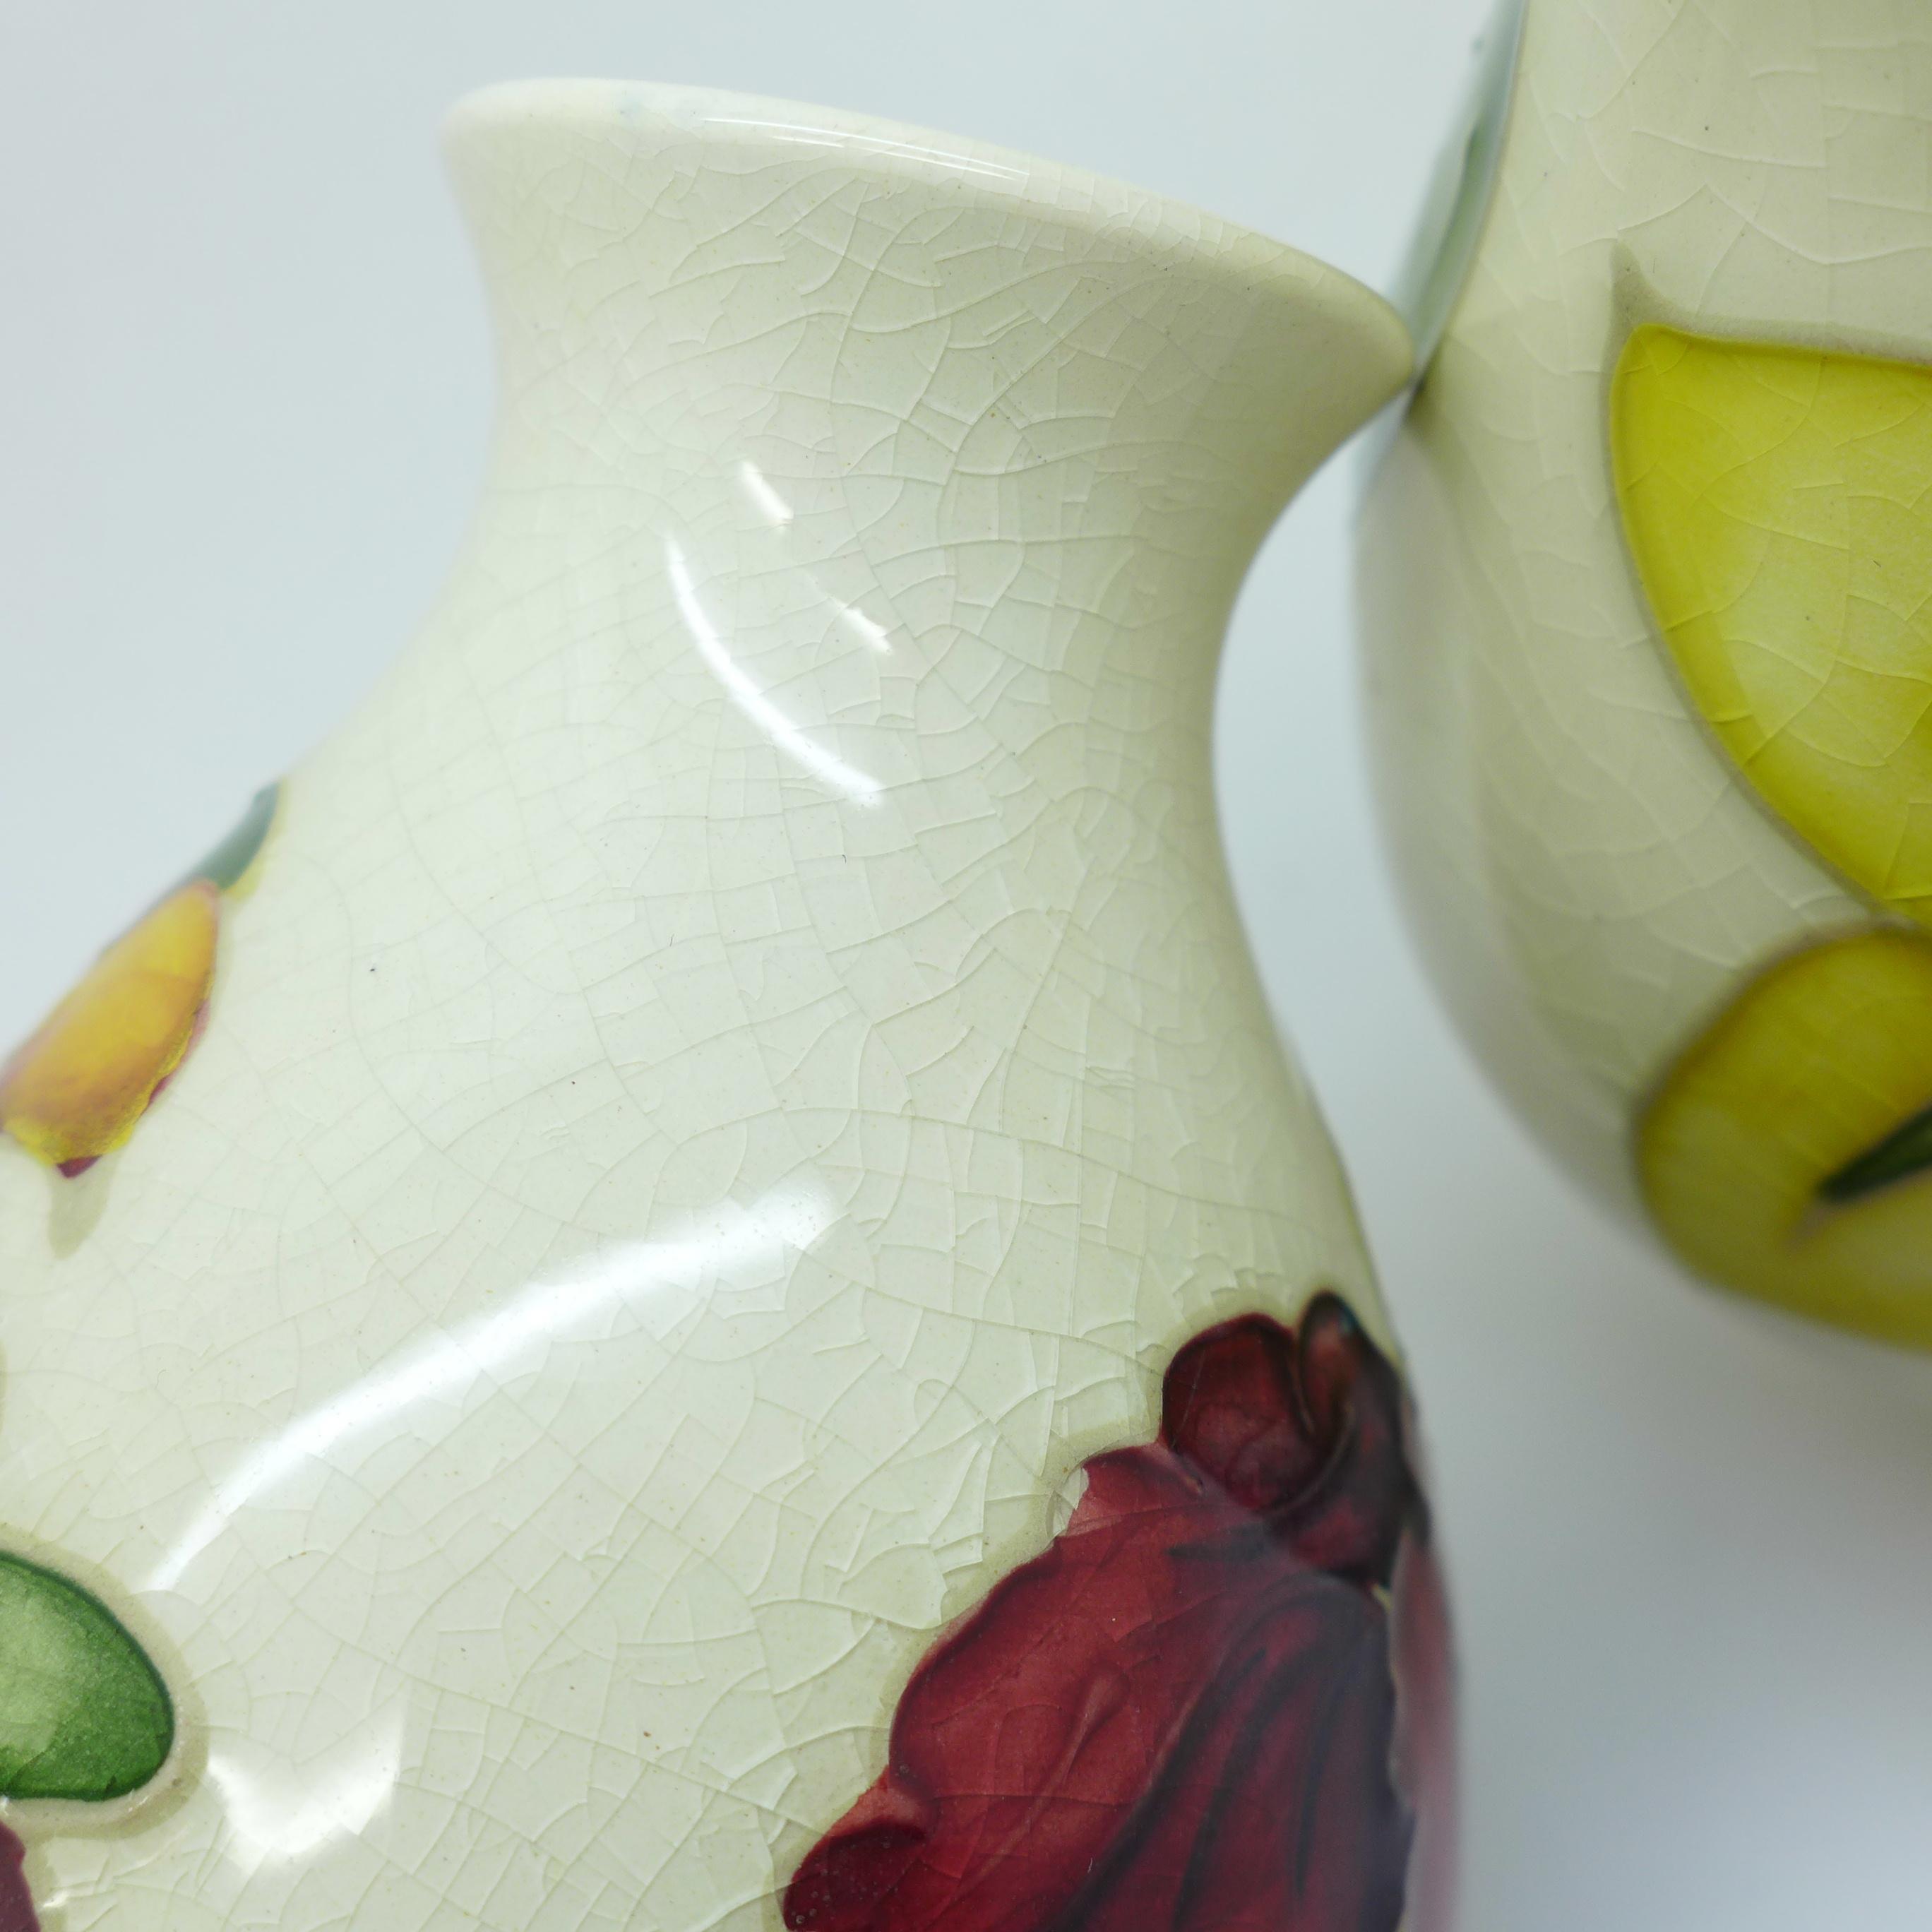 Two Moorcroft vases, crazed, 92mm, (57,58) - Image 5 of 7